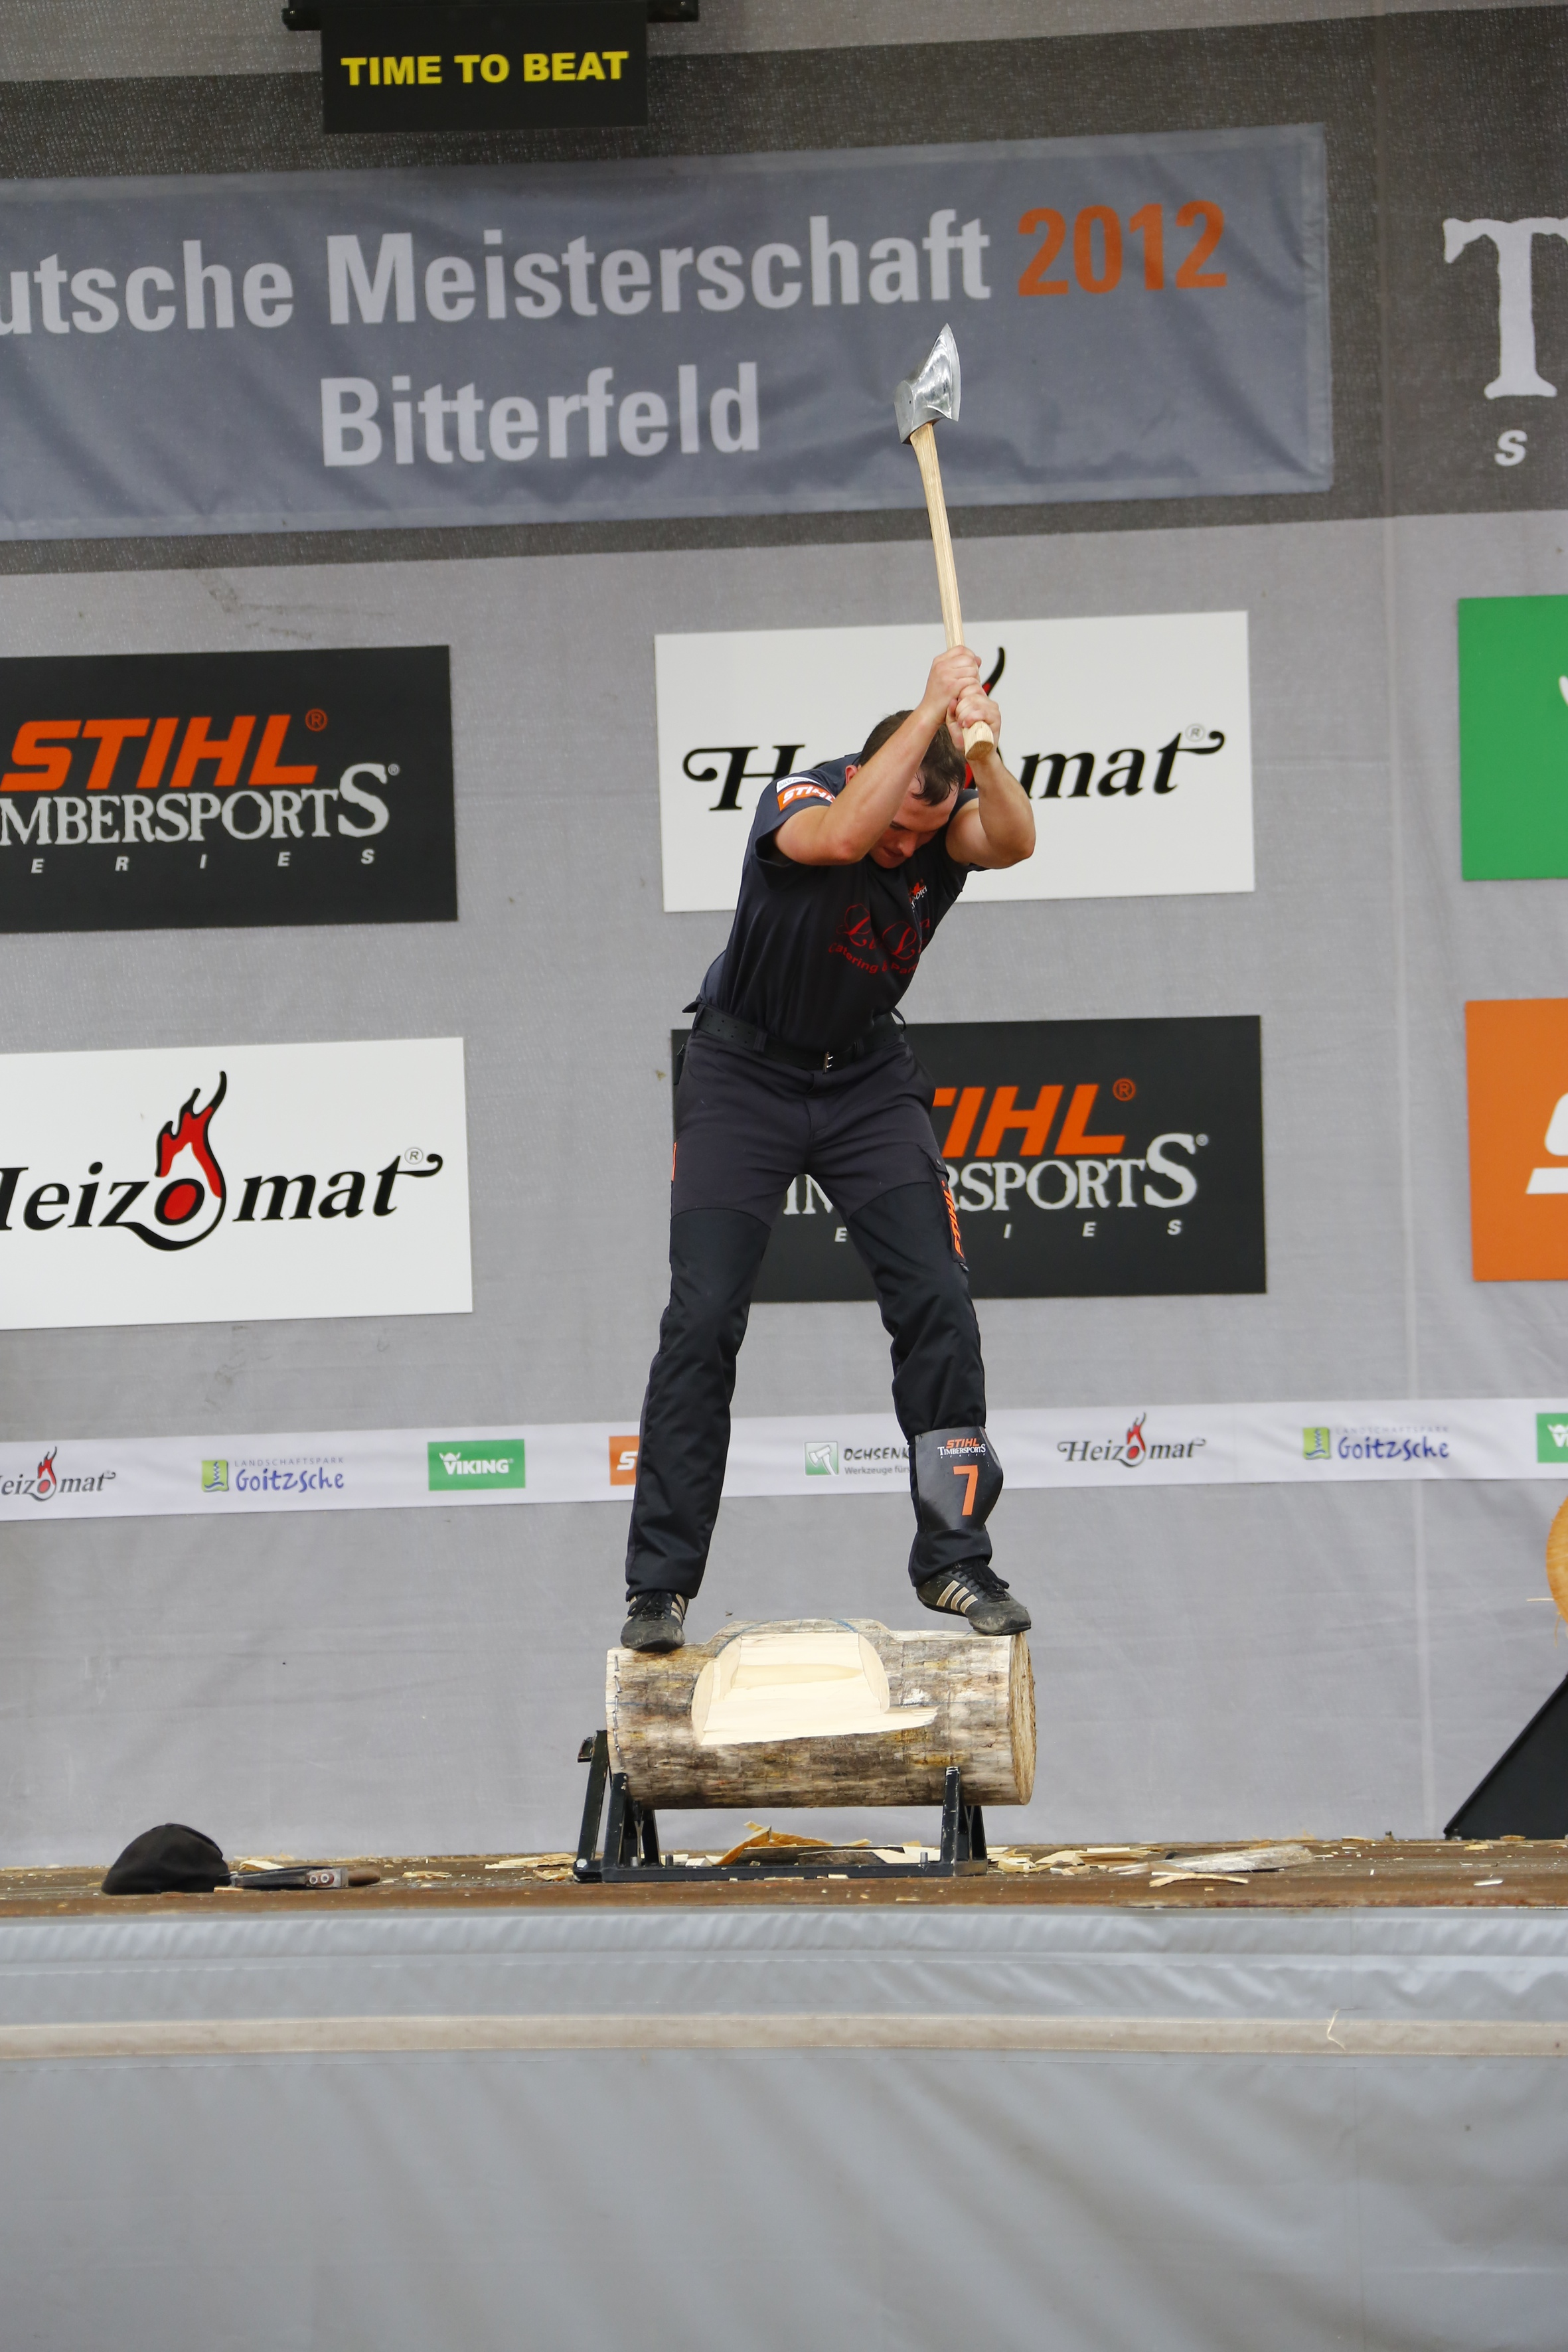 Stihl Timbersports German Championships 2012